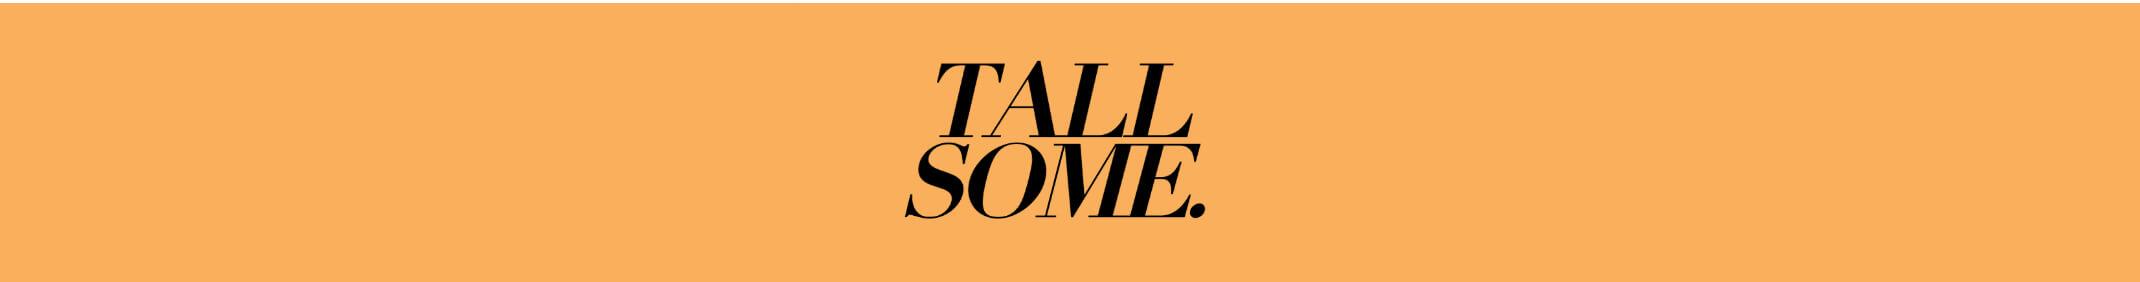 Tallsome